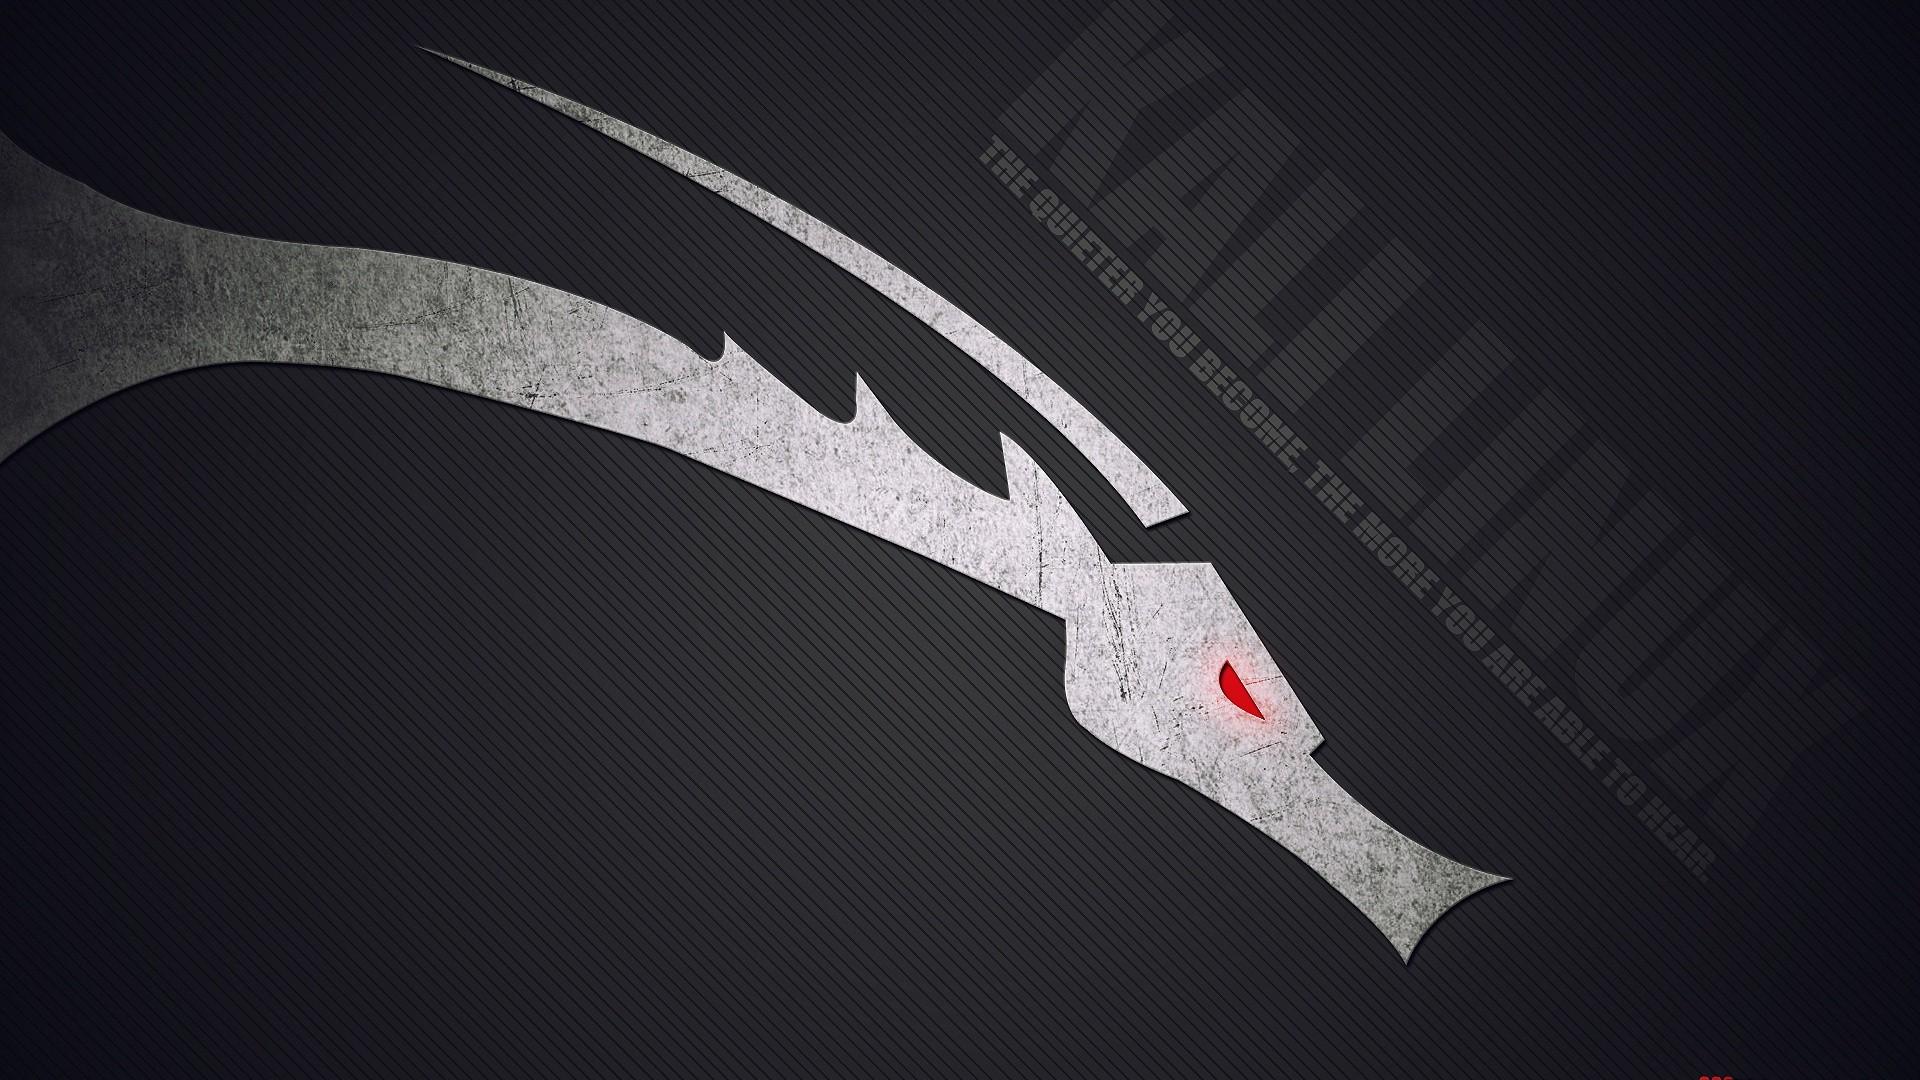 Kali Linux Desktop Pc And Mac Wallpaper Pictures